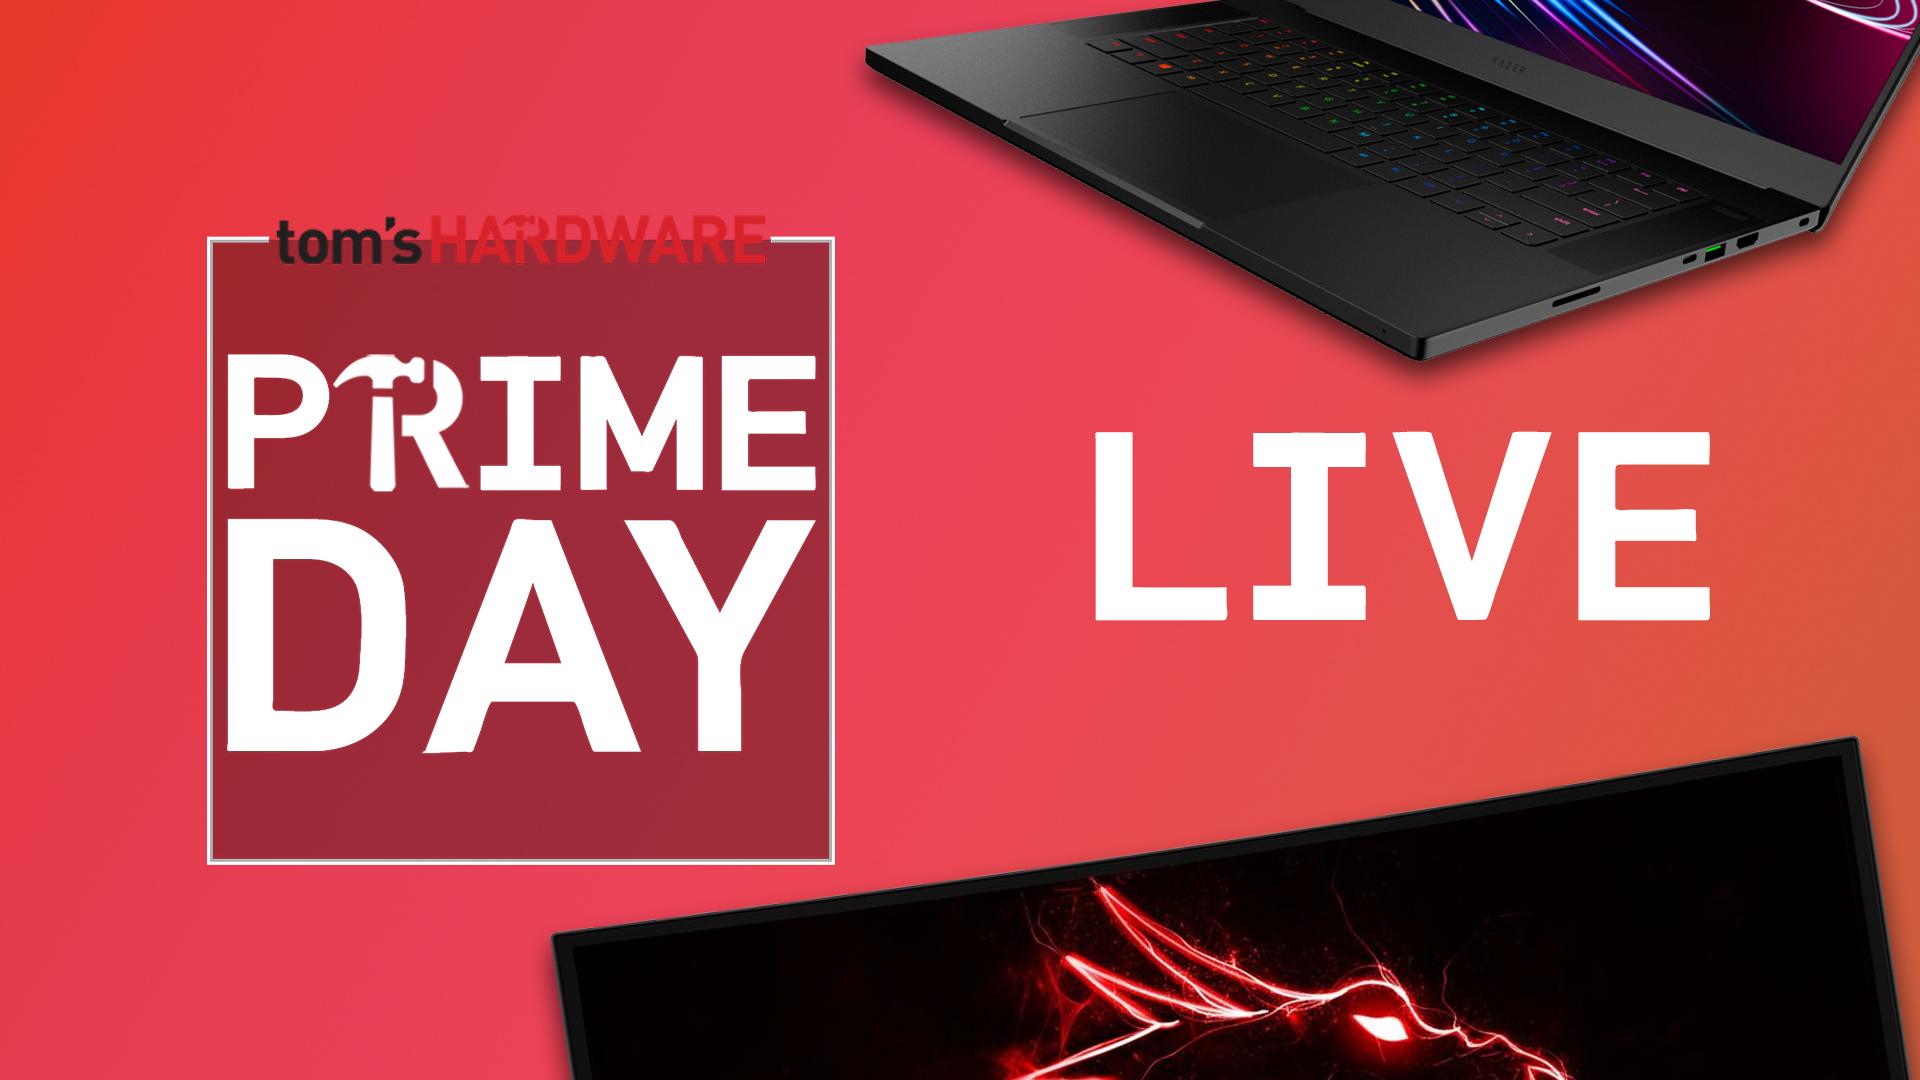 Amazon Prime Day 2021 Live Blog: The Best Tech & PC Hardware Deals